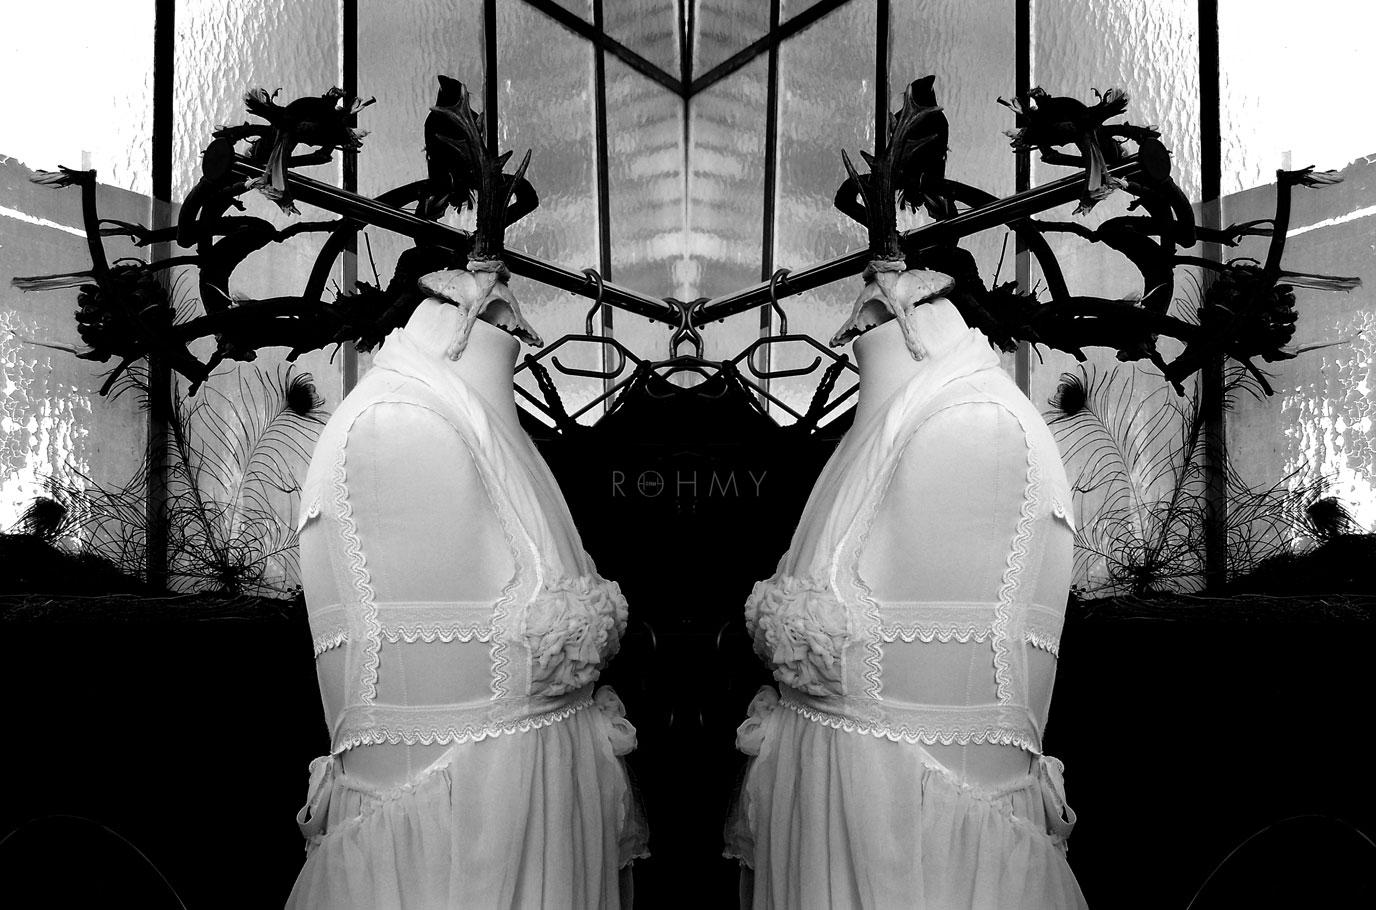 Fashion: ROHMY / Impressionen Fashion City East/ www.allaboutrohmy.com